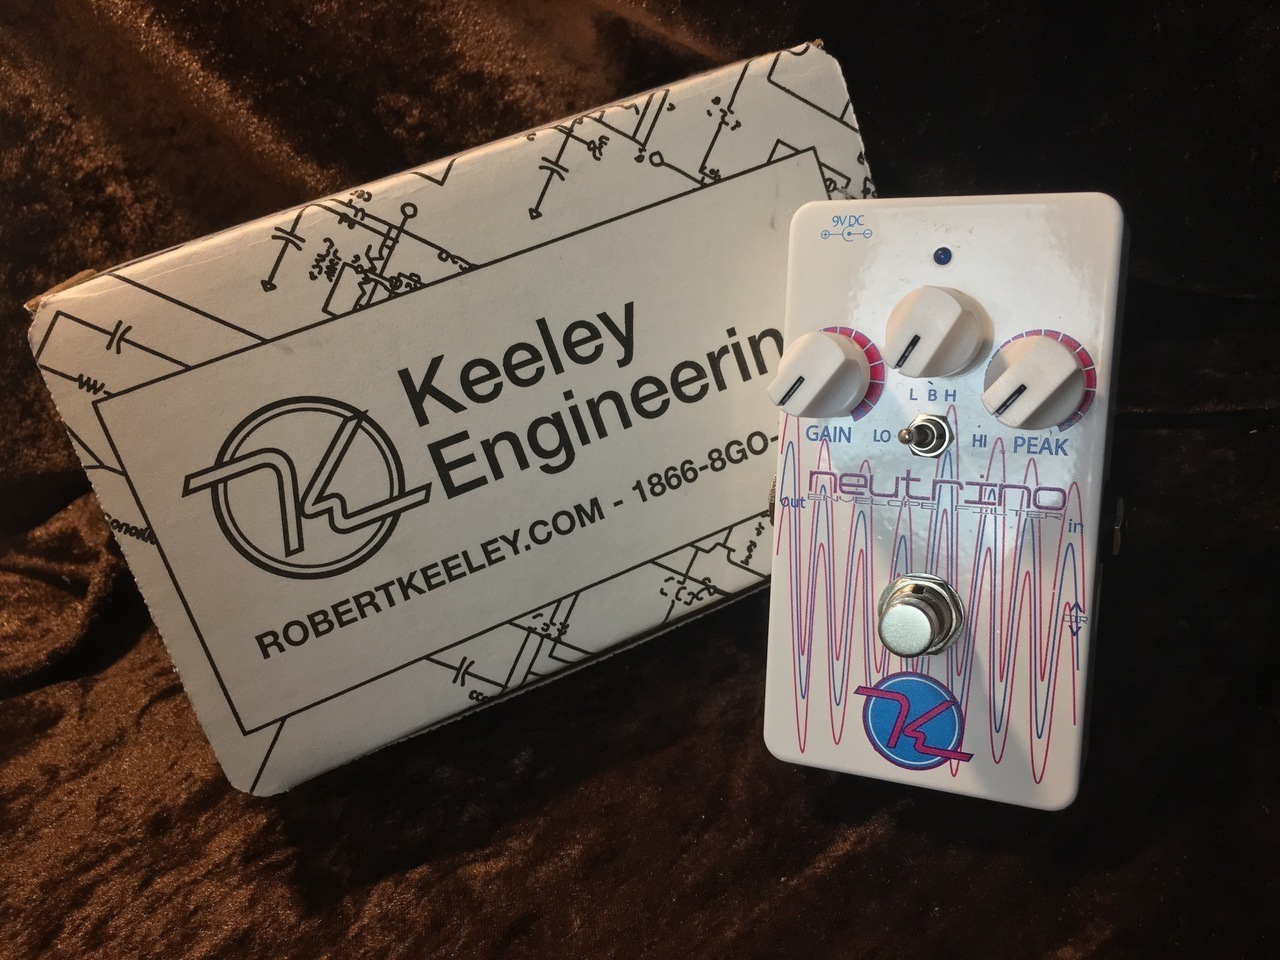 Keeley neutrino ☆! 11/20 (Tuesday) until 20! ☆